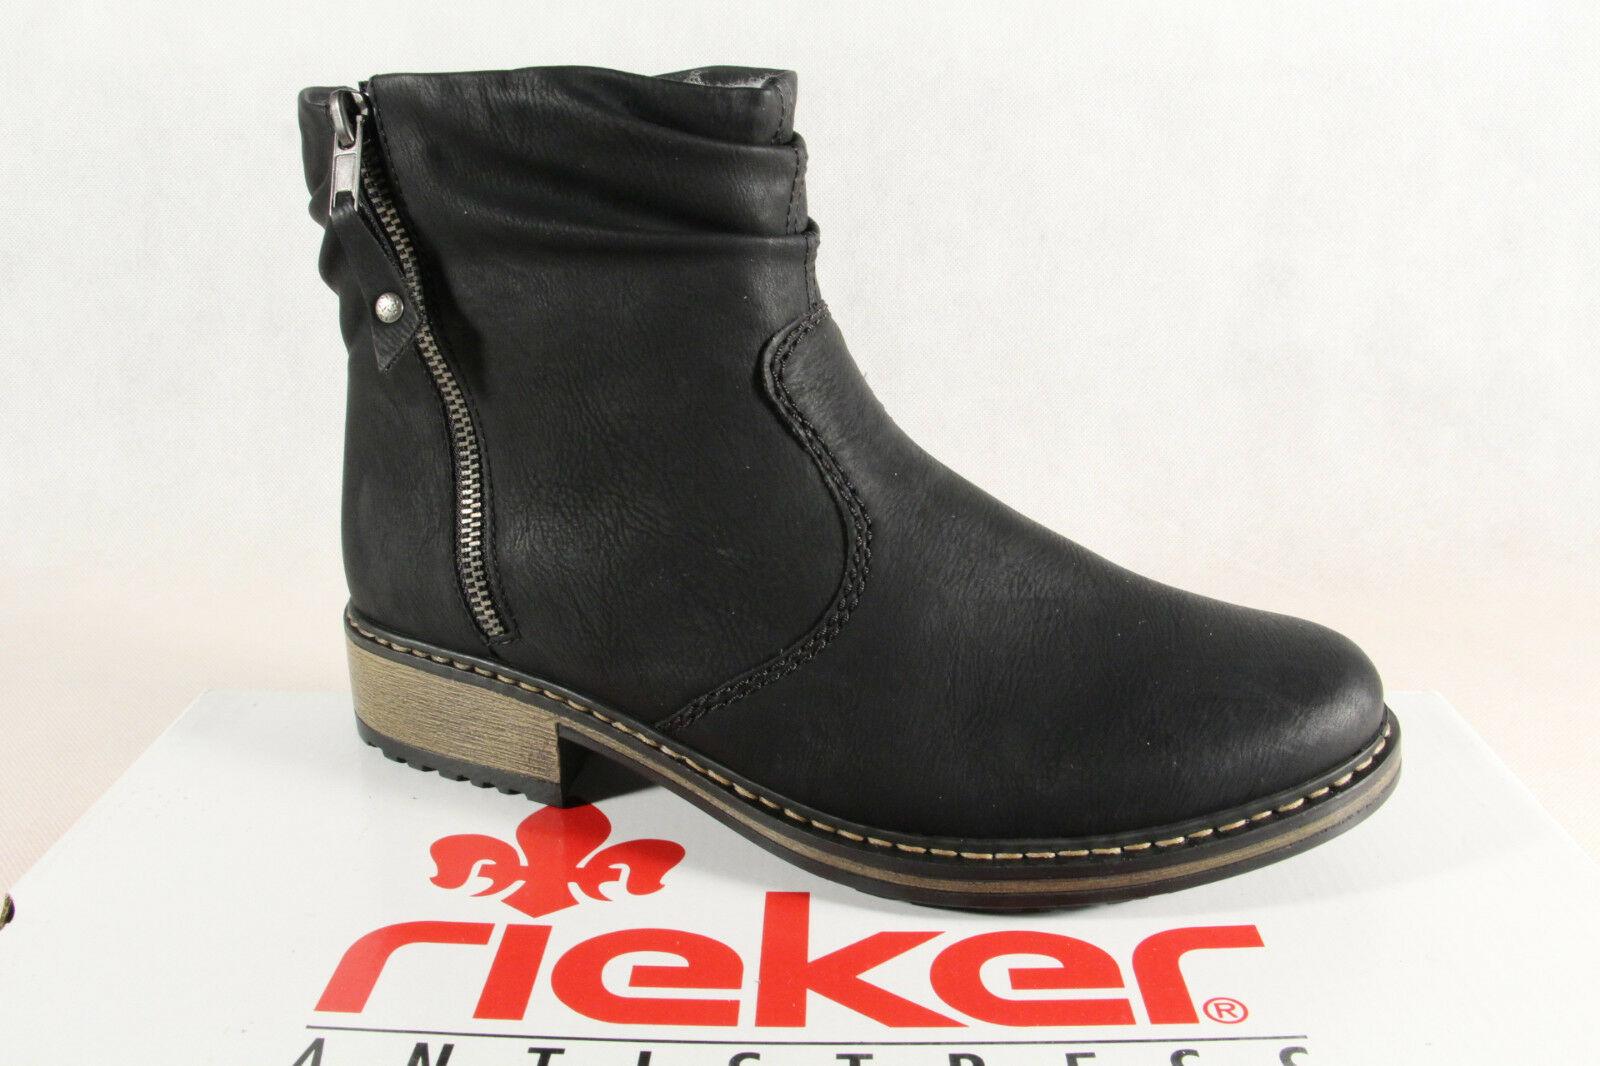 best website 559d6 e0abd Rieker Stiefel Stiefeletten Stiefel, Winterstiefel schwarz ...